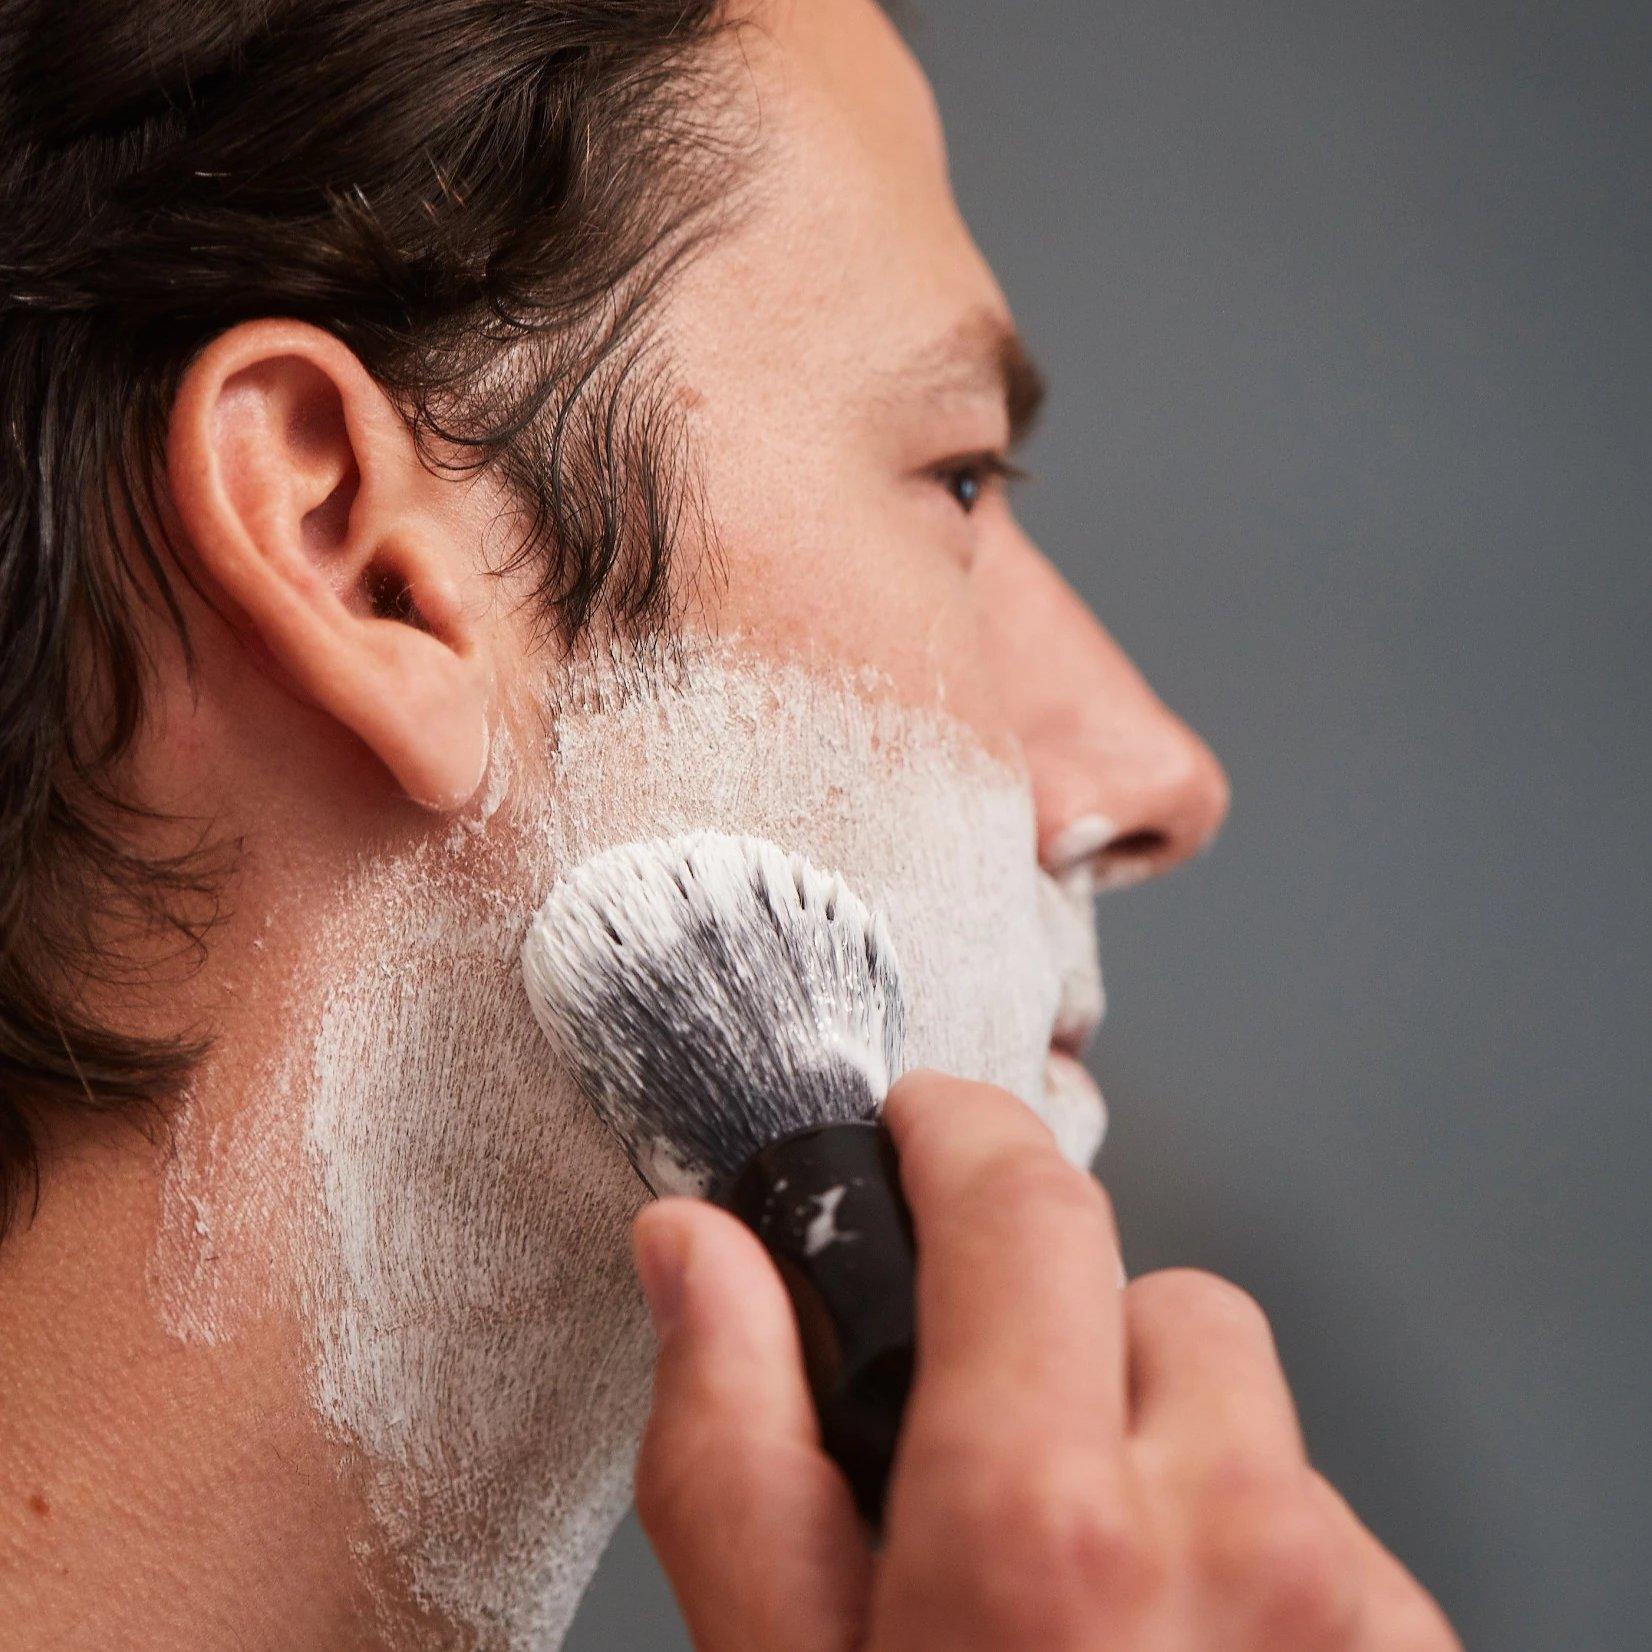 OneBlade shave brush applying shaving cream to face